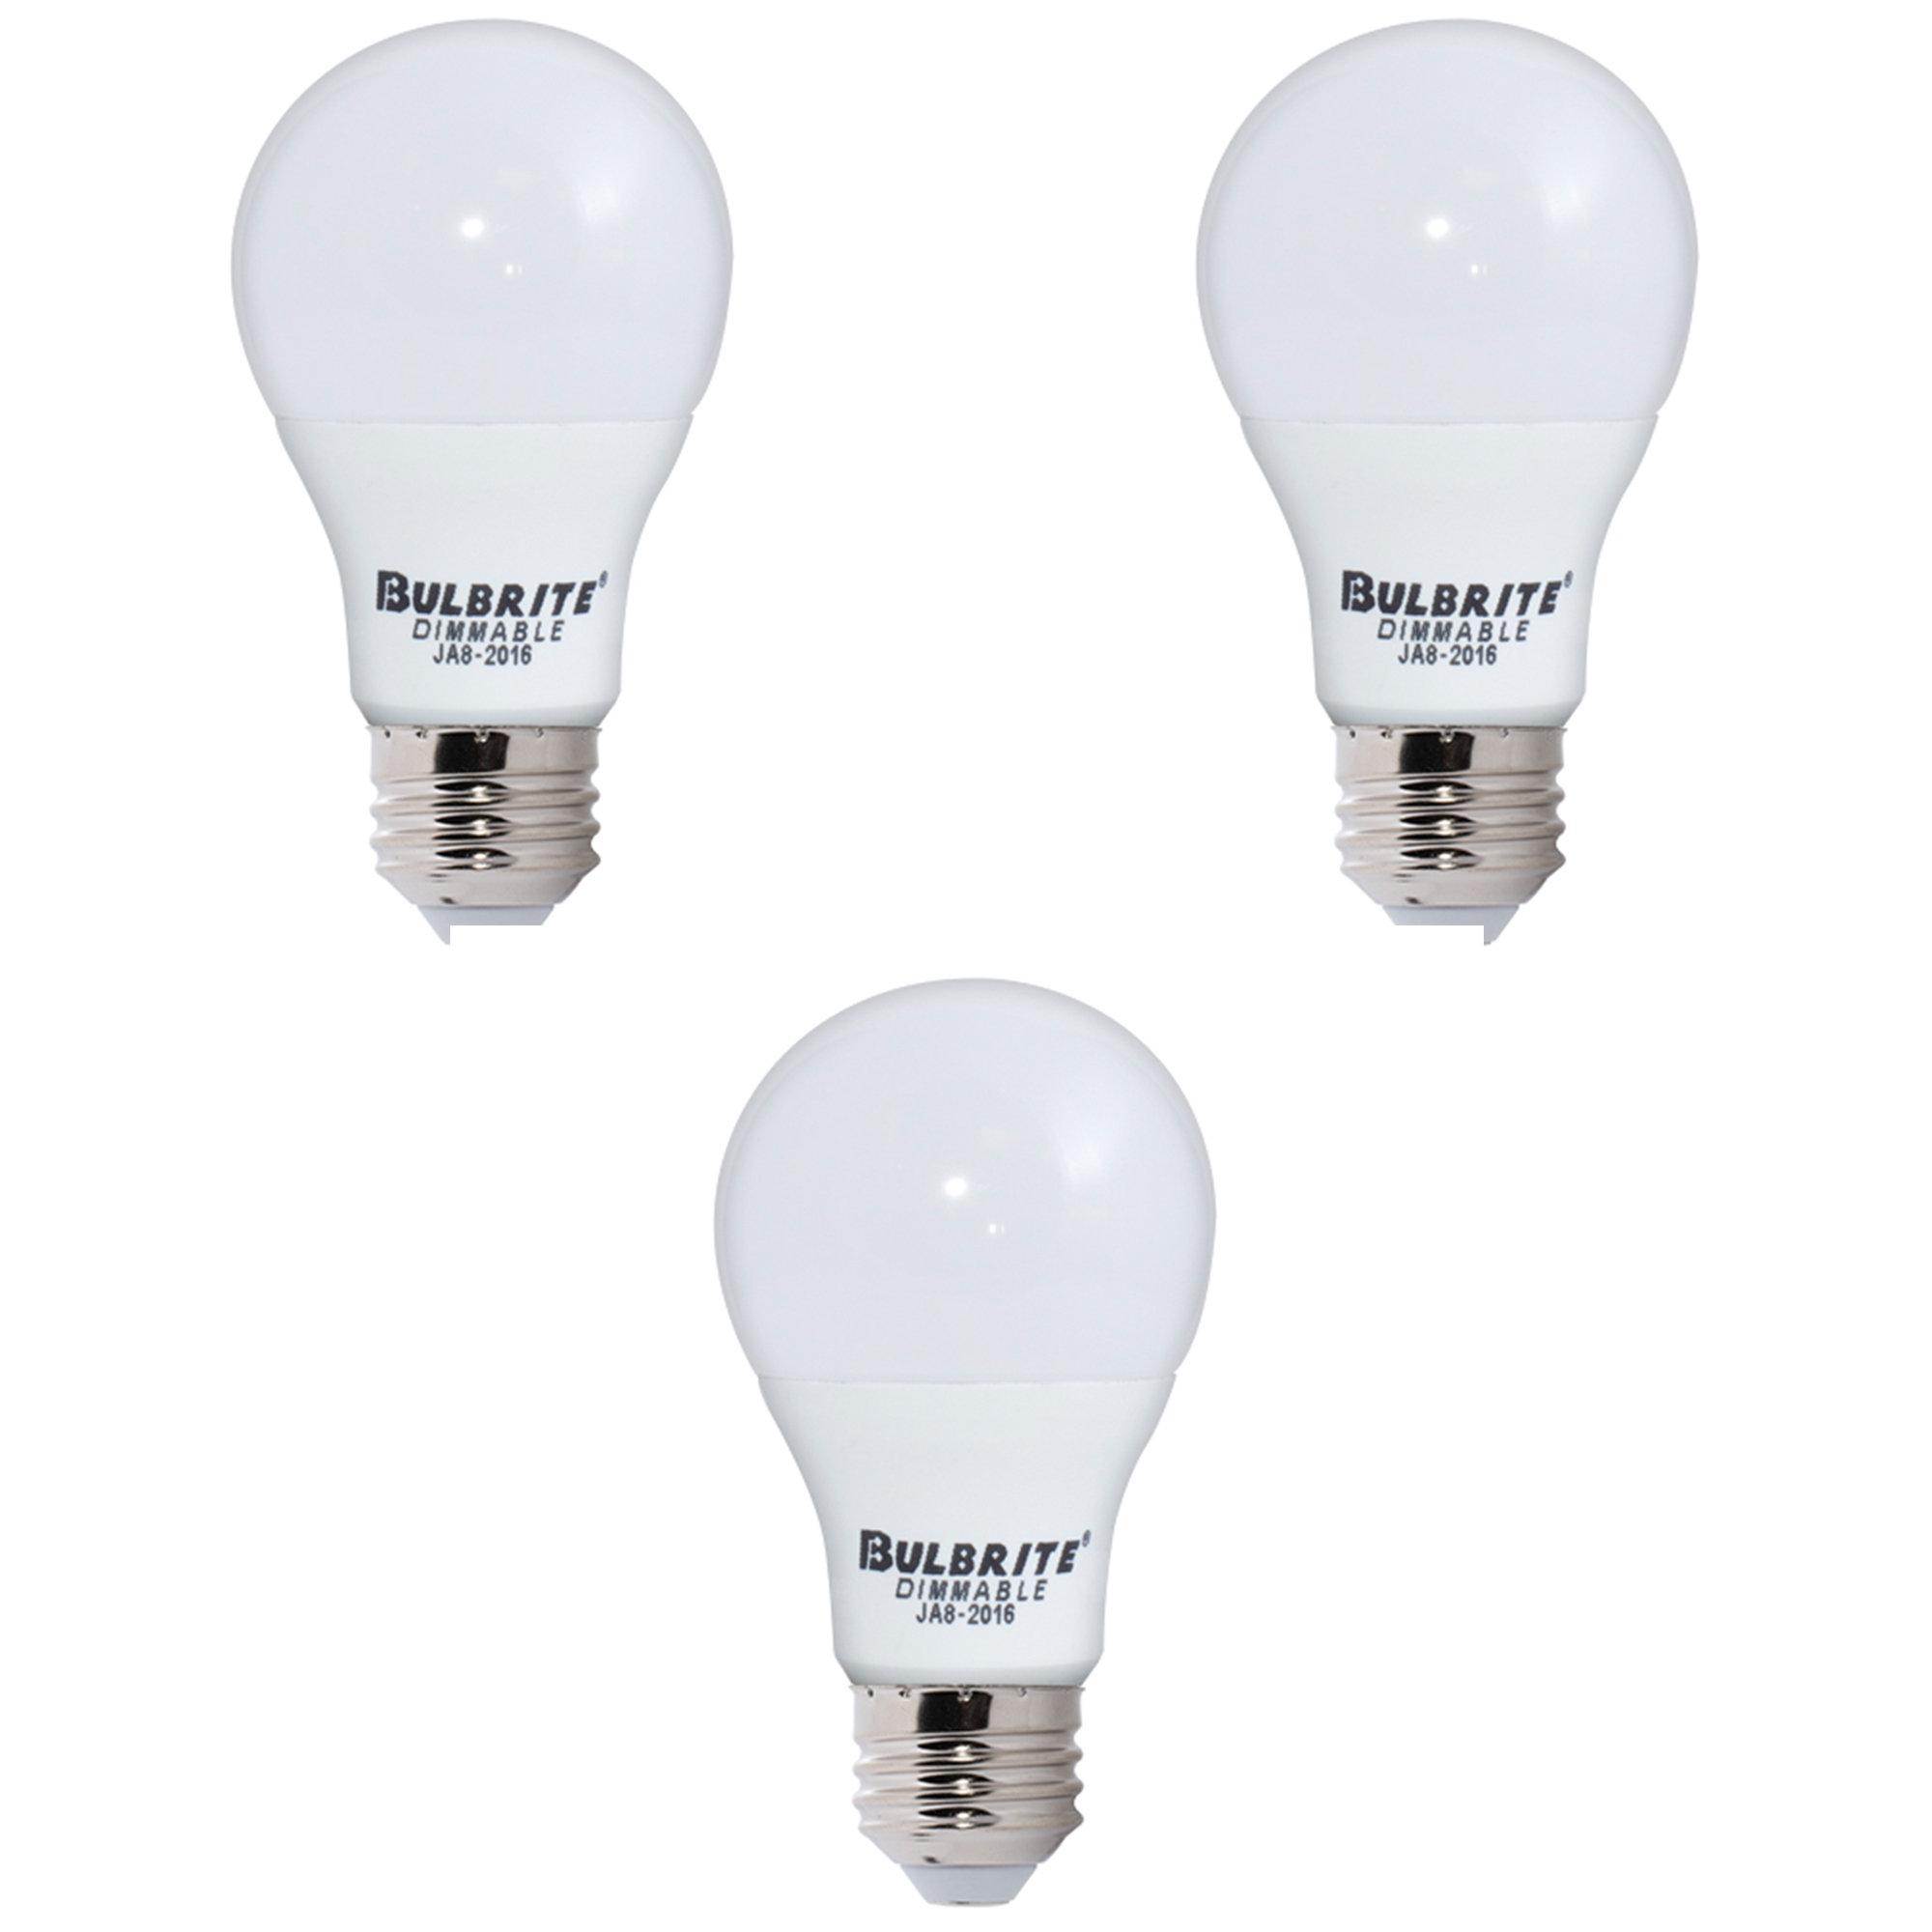 60 Watt Equivalent A19 Led Dimmable Light Bulb E26 Medium Standard Base Reviews Birch Lane